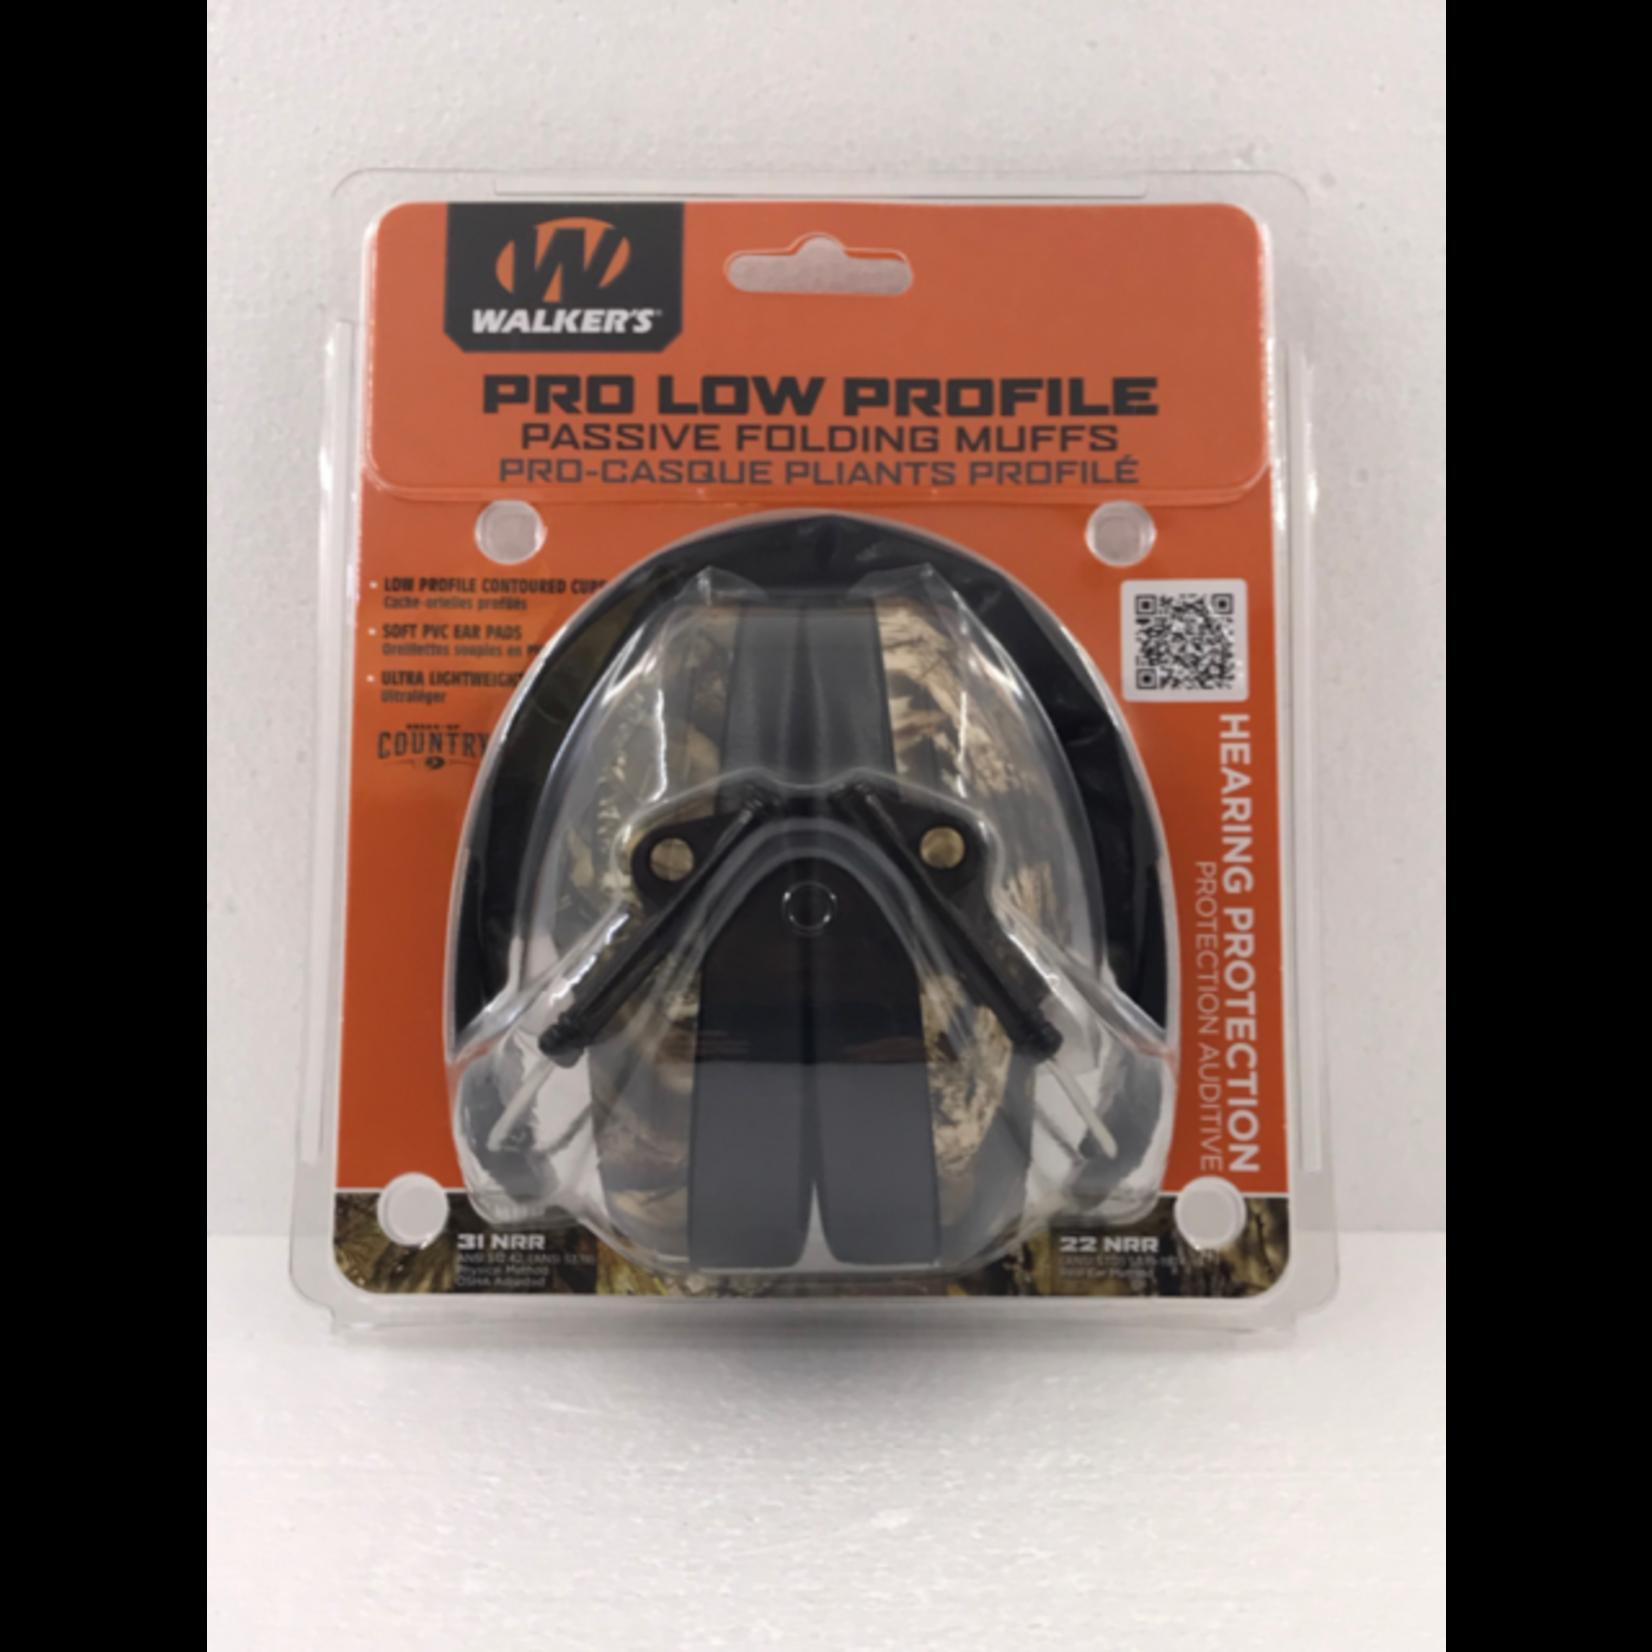 Walker Pro Low Profile Passive Folding Muffs